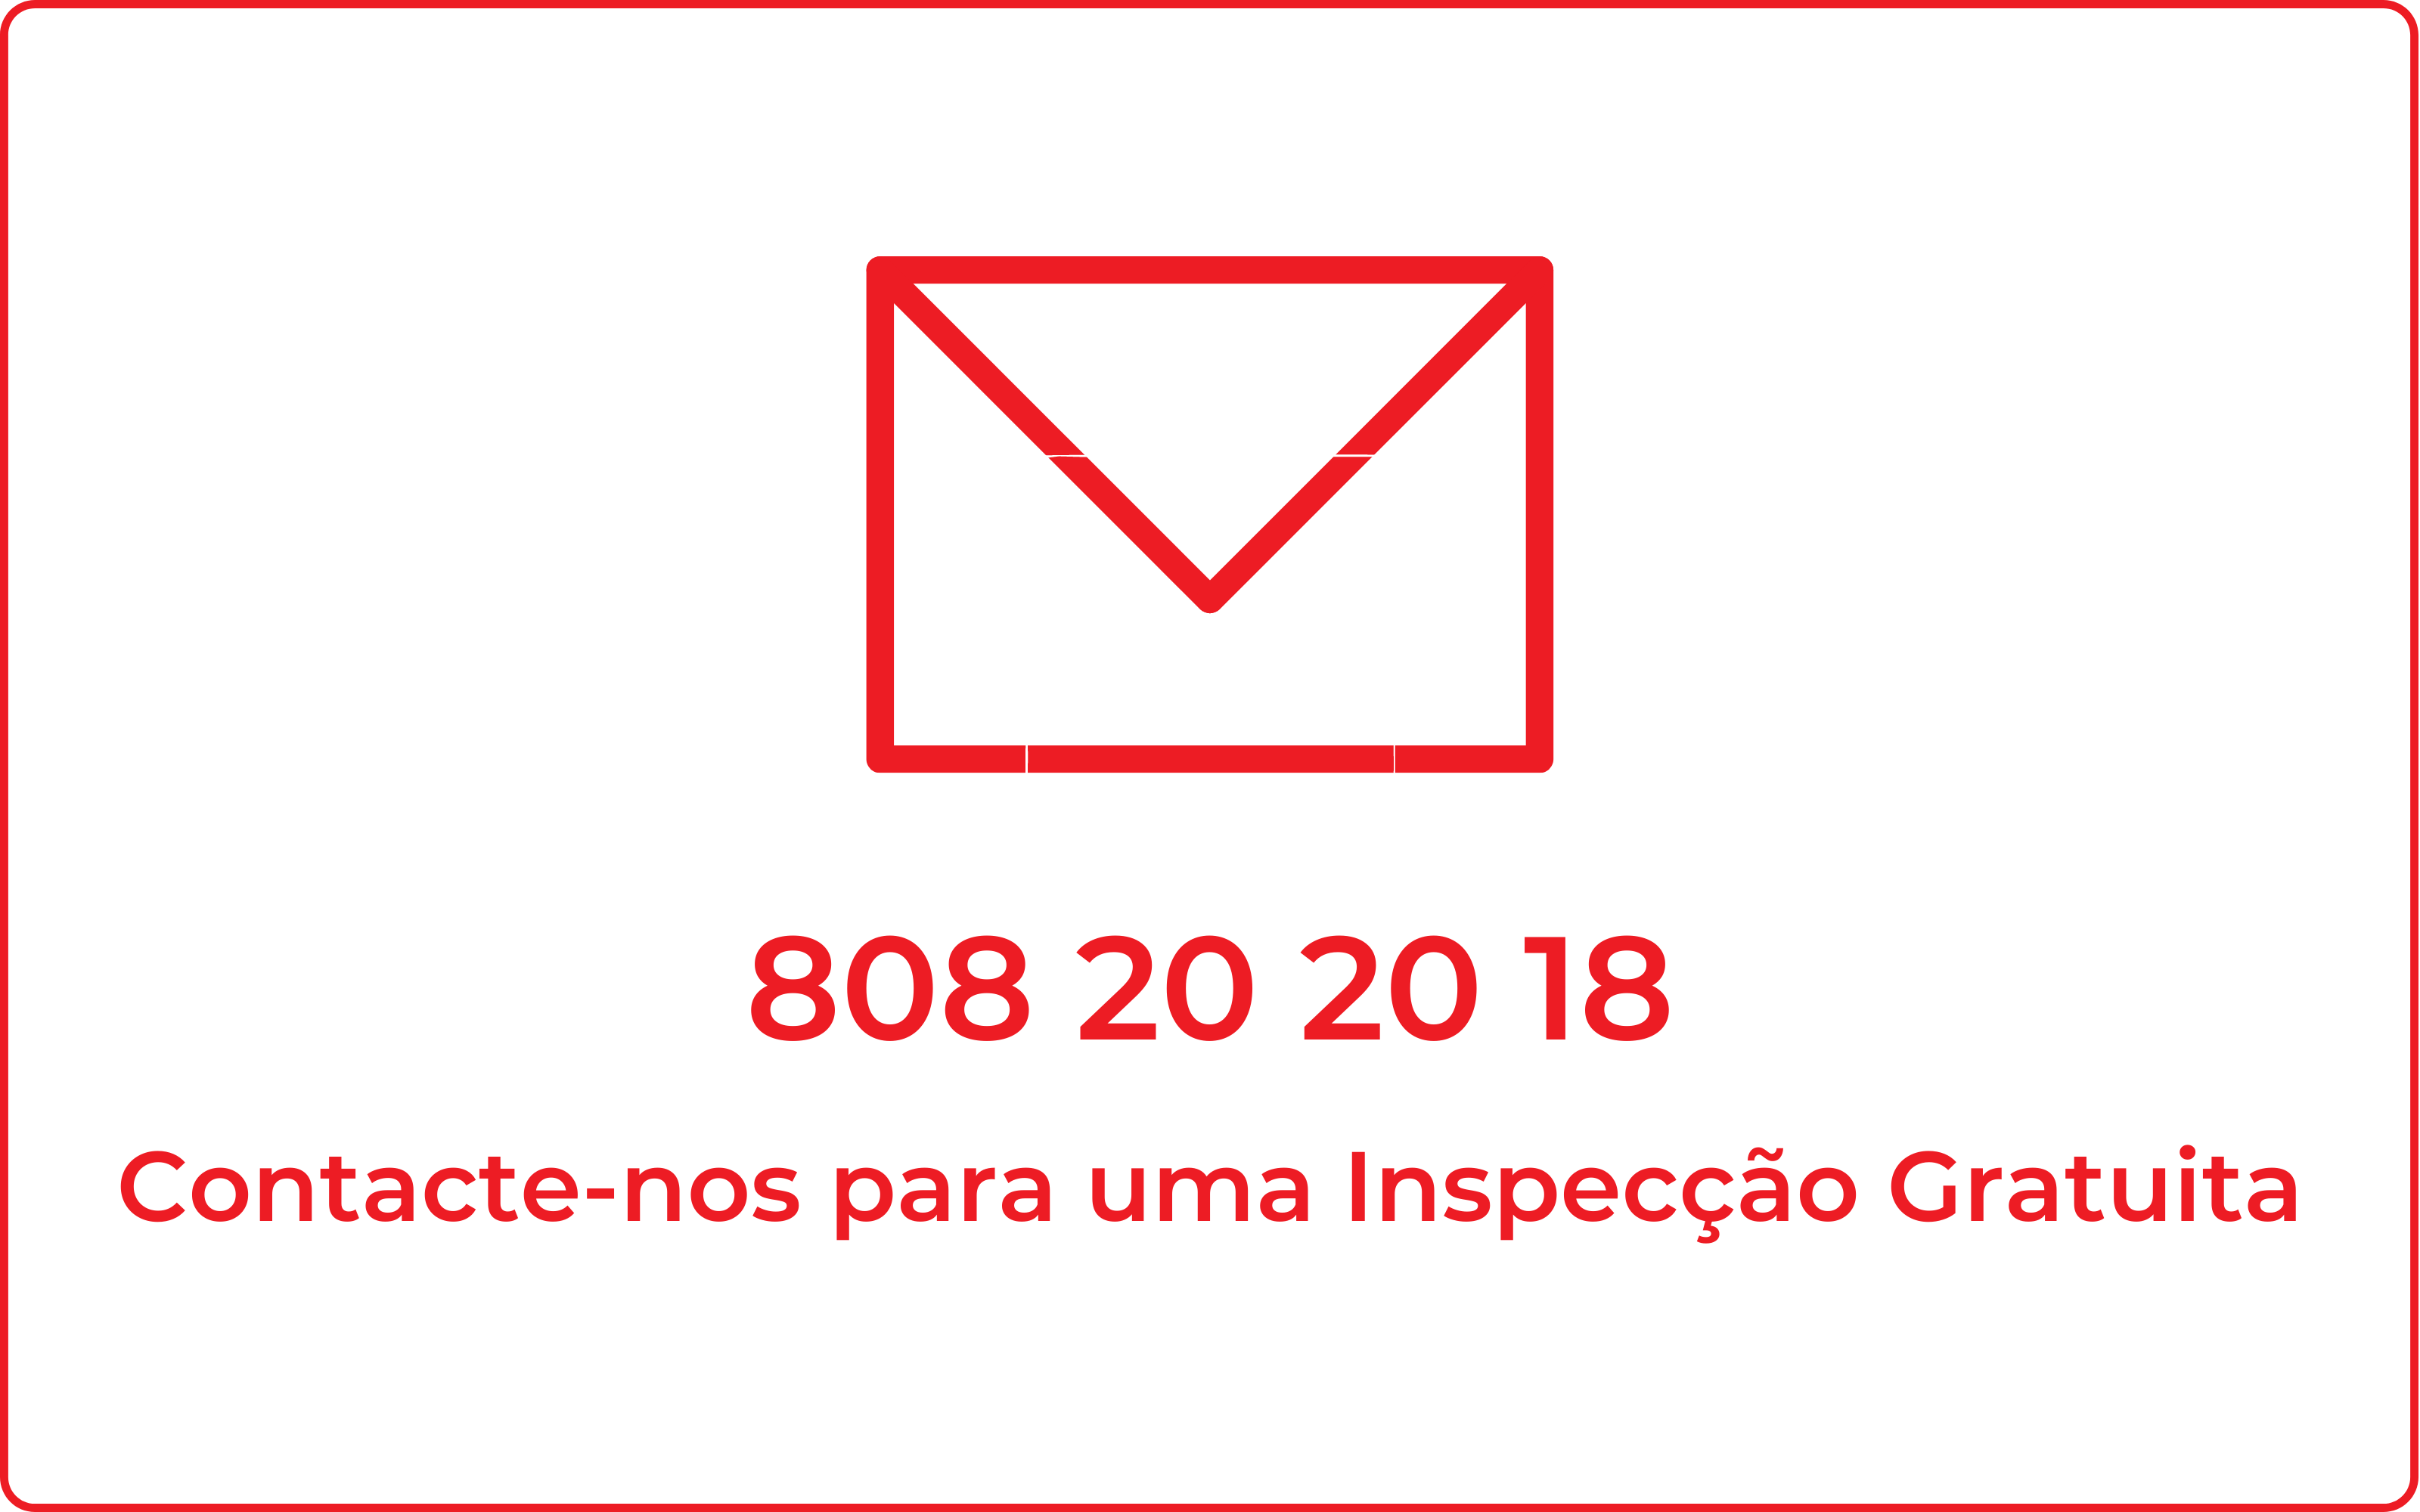 808 20 20 18 Rentokil Contacte Portgual